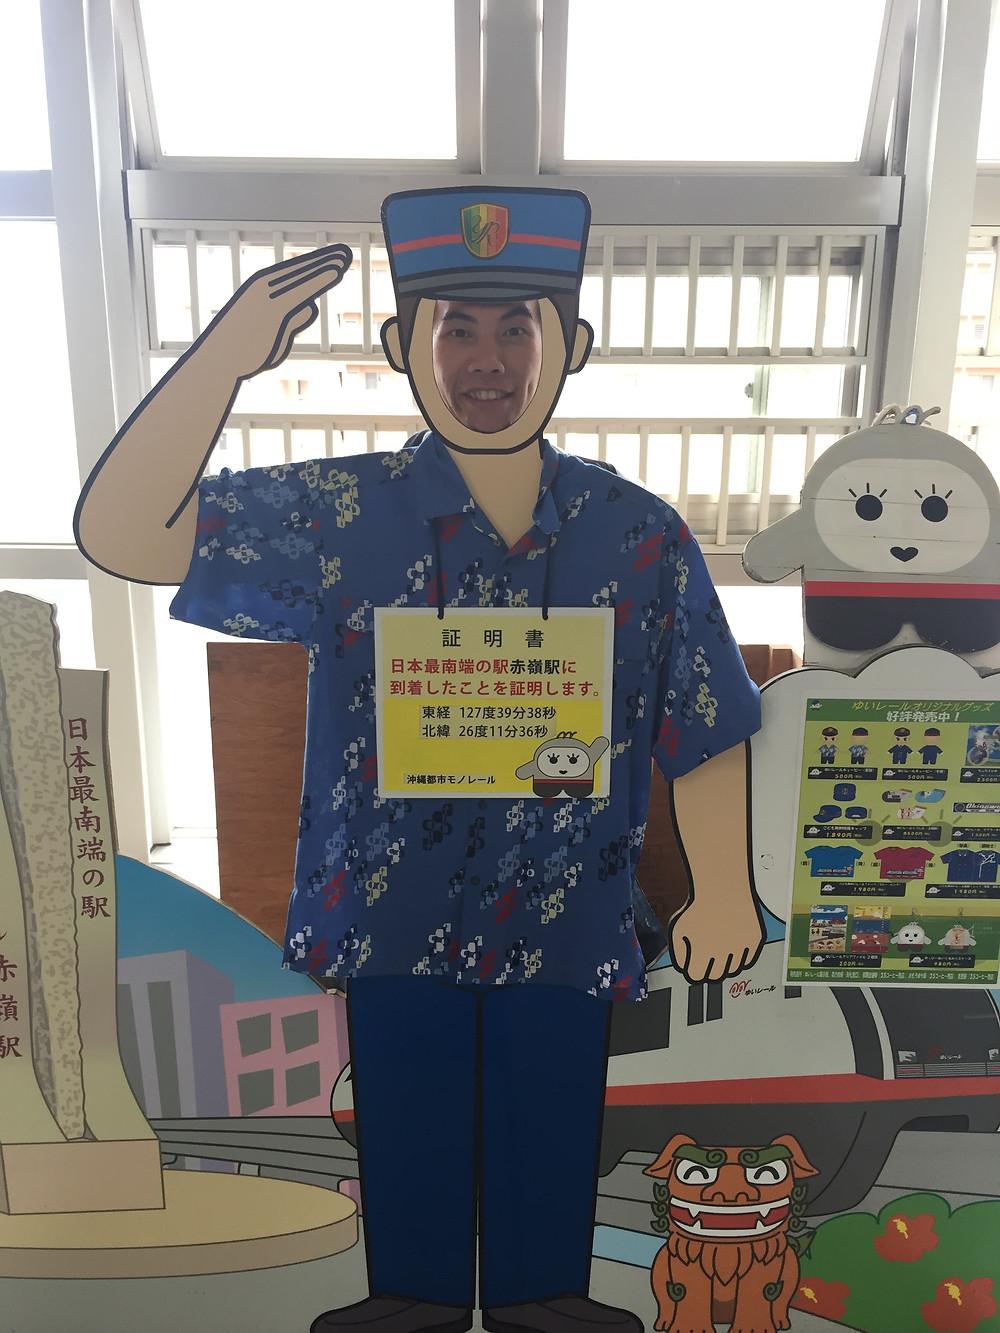 Chéri qui s'amuse à Okinawa